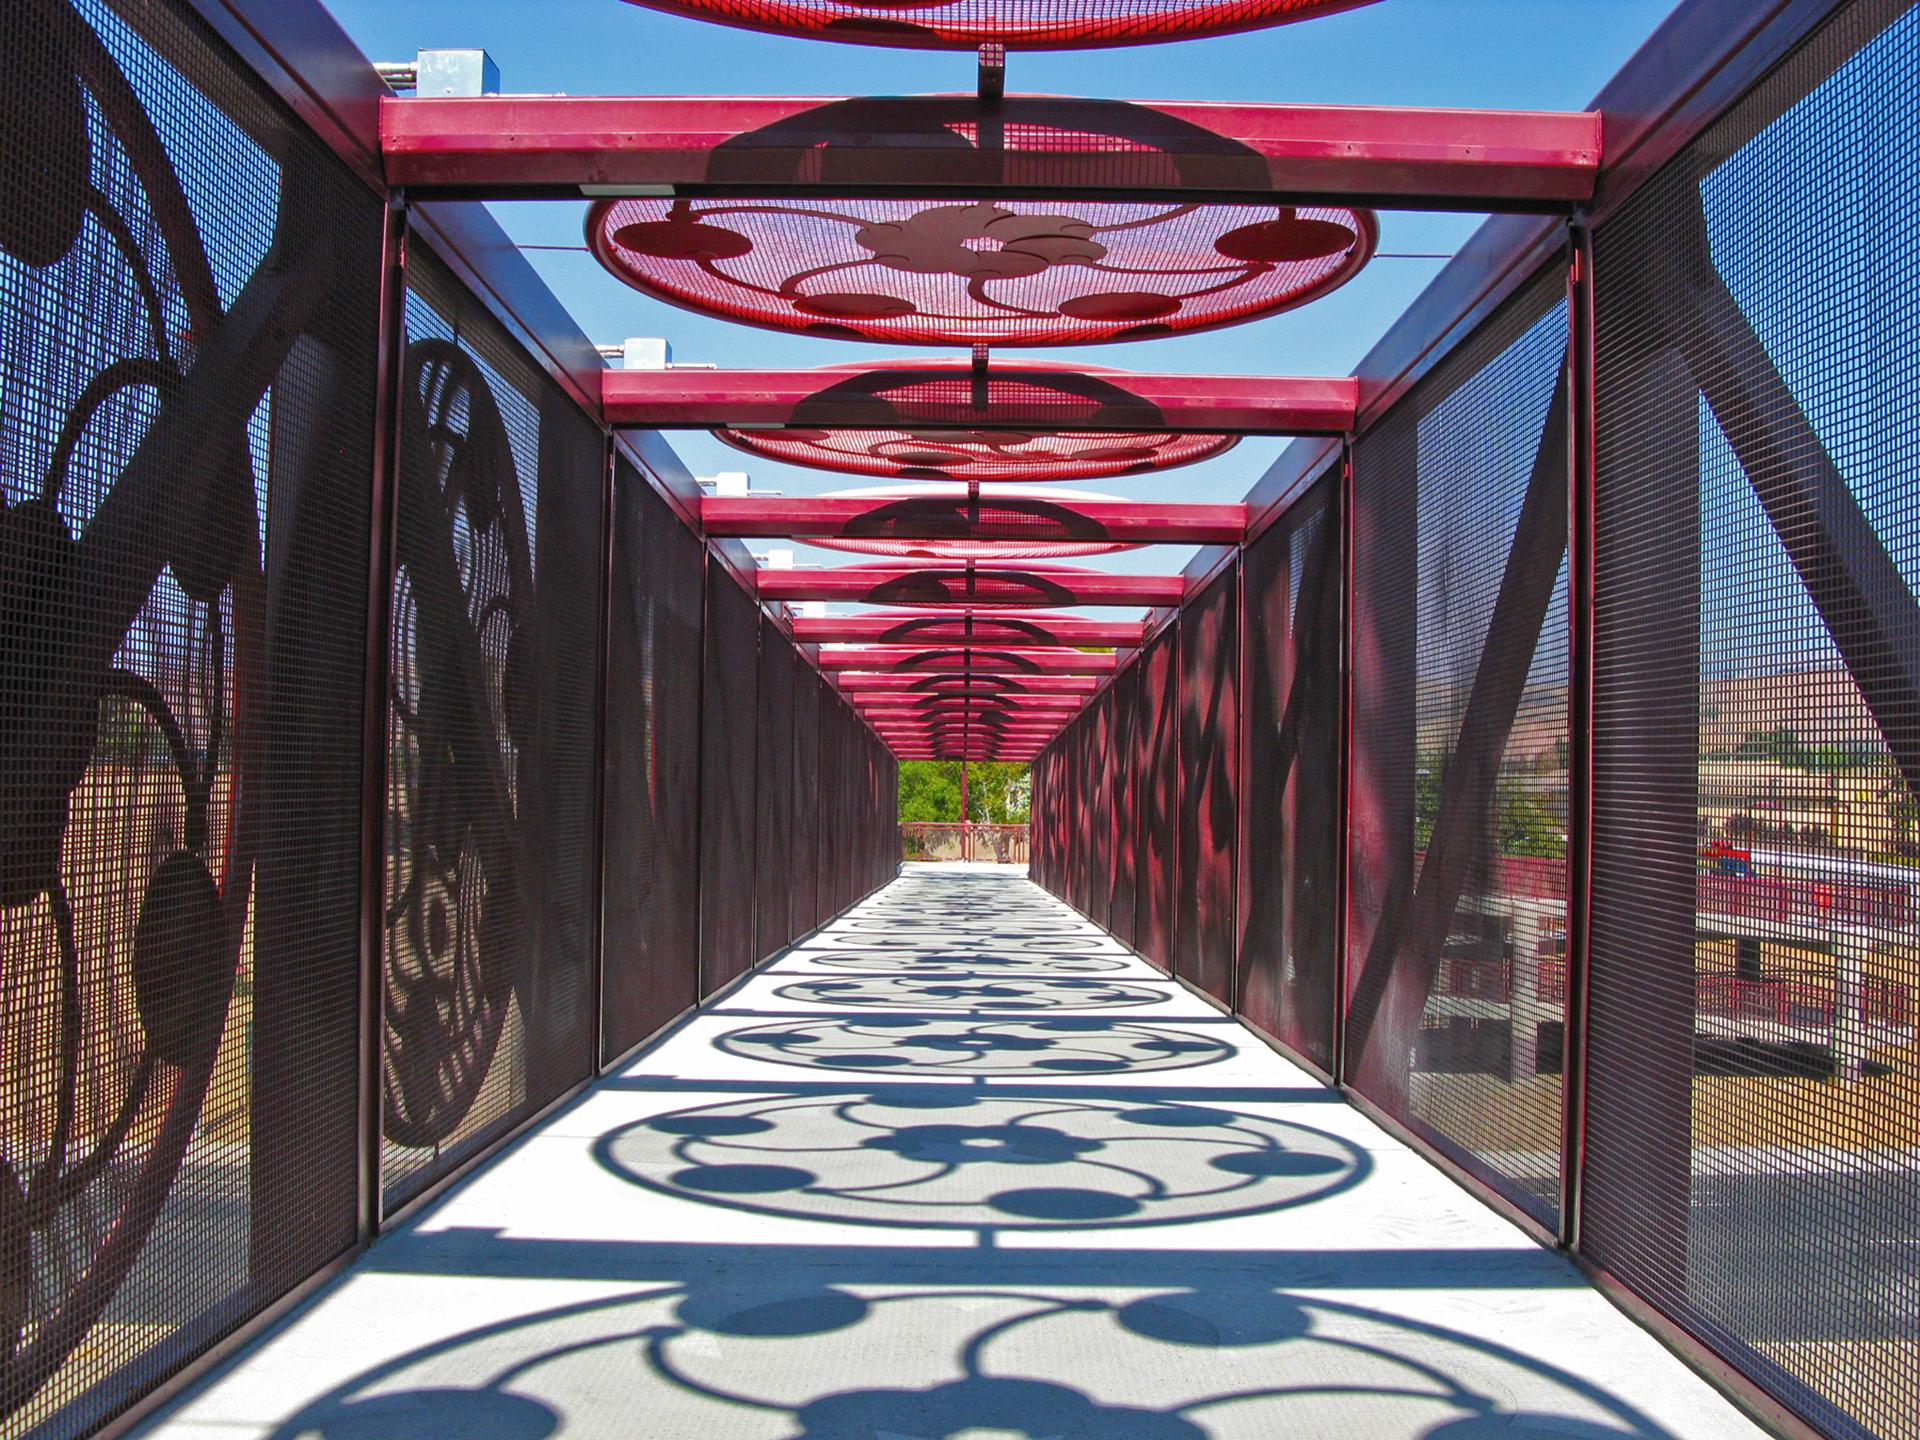 Blossom Hill Pedestrian Bridge